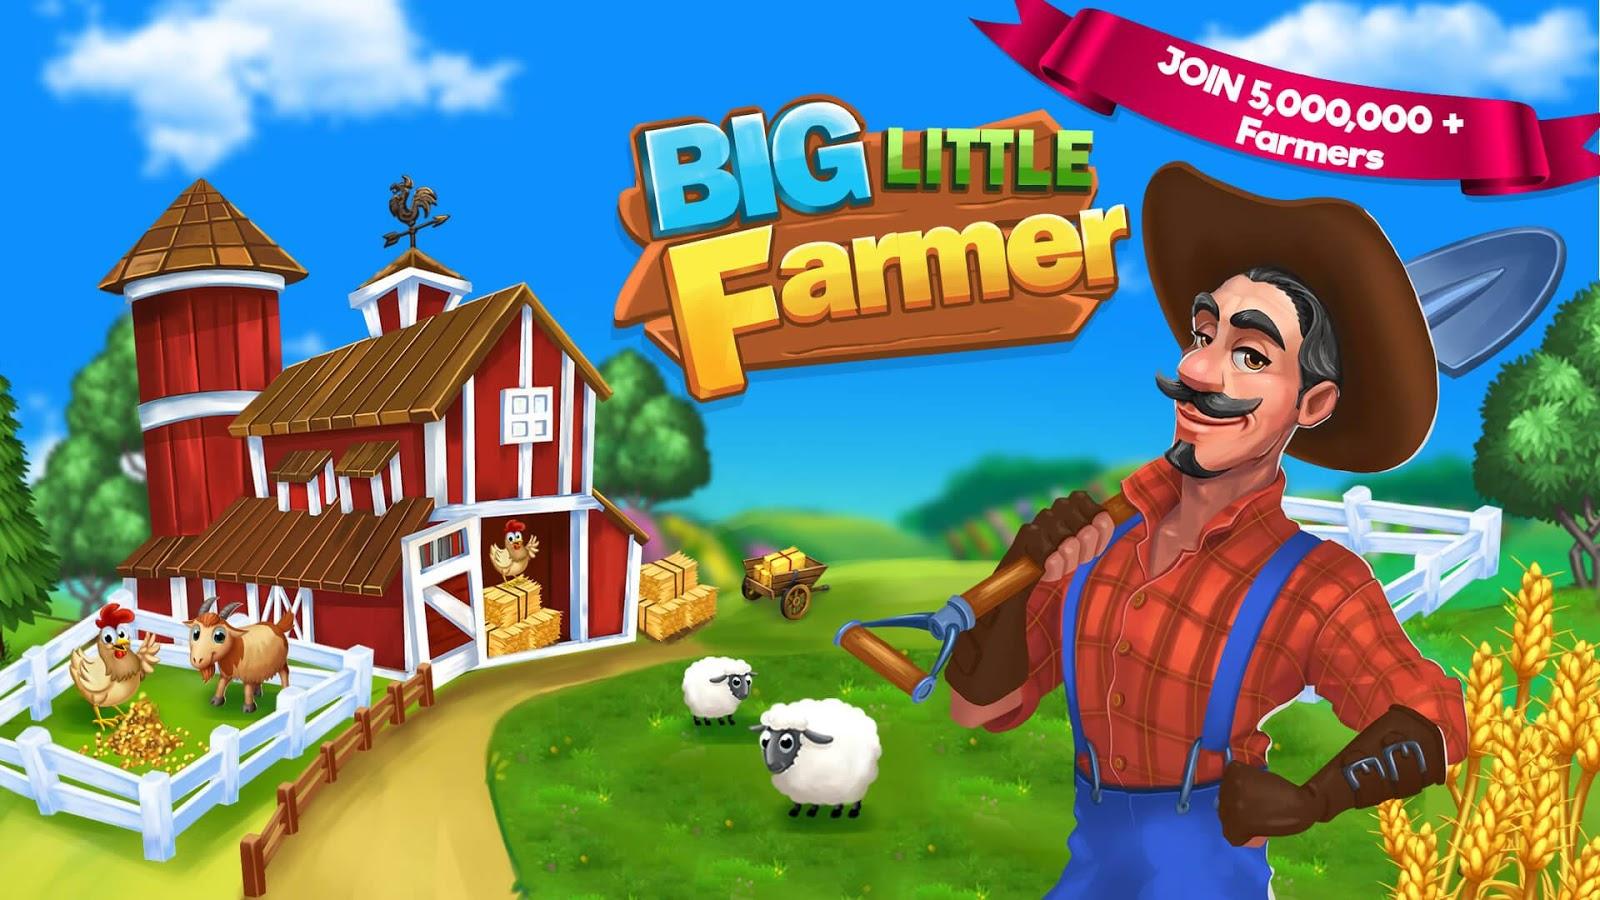 Offline farm games for android free download apk | Farm Drift 3D MOD